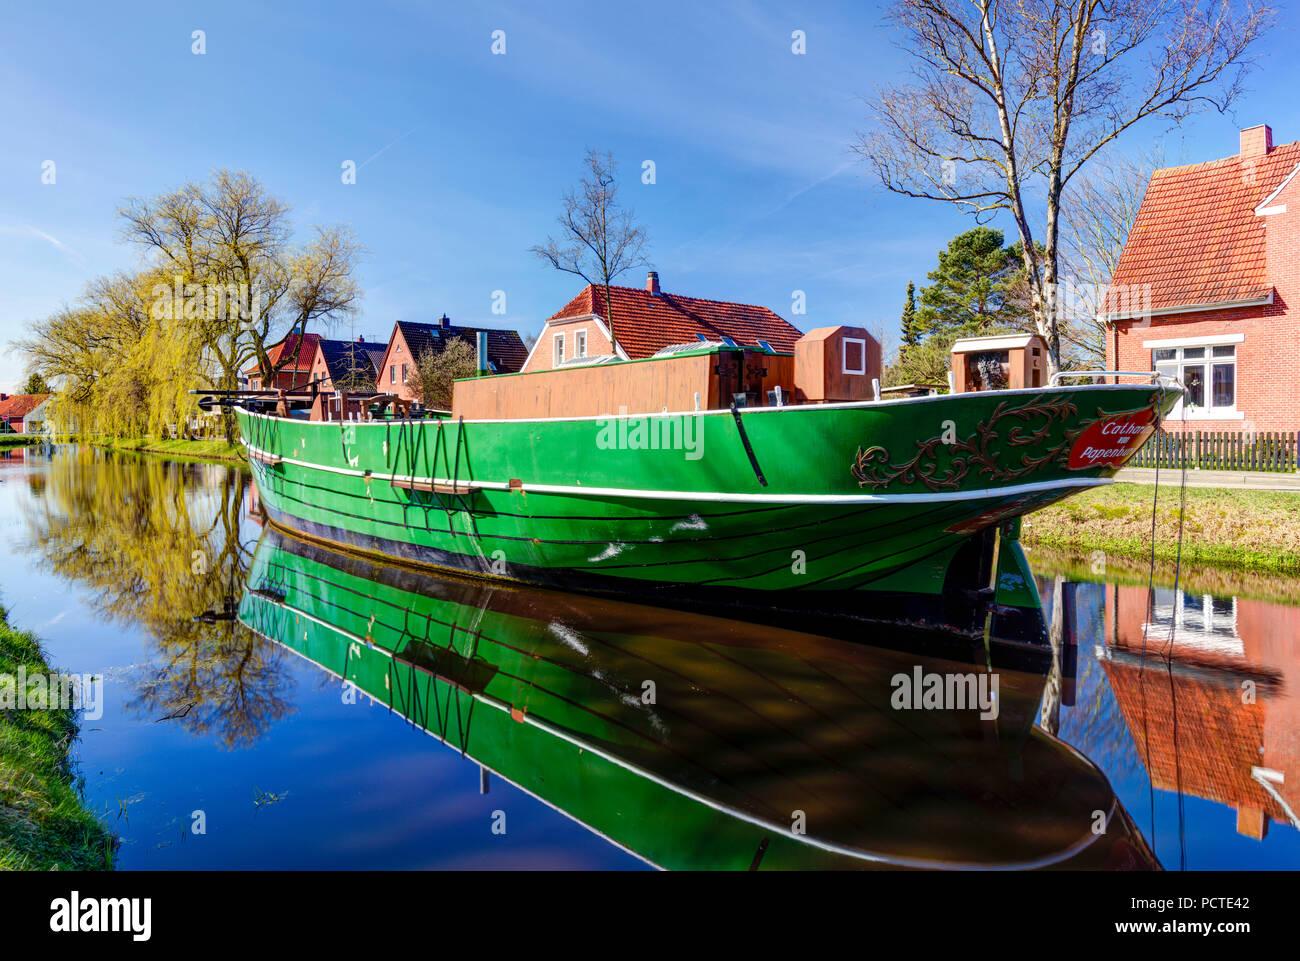 Museum ship, Catharina von Papenburg, in the Wiek, spring, Papenburg, Emsland, Lower Saxony, Germany, - Stock Image